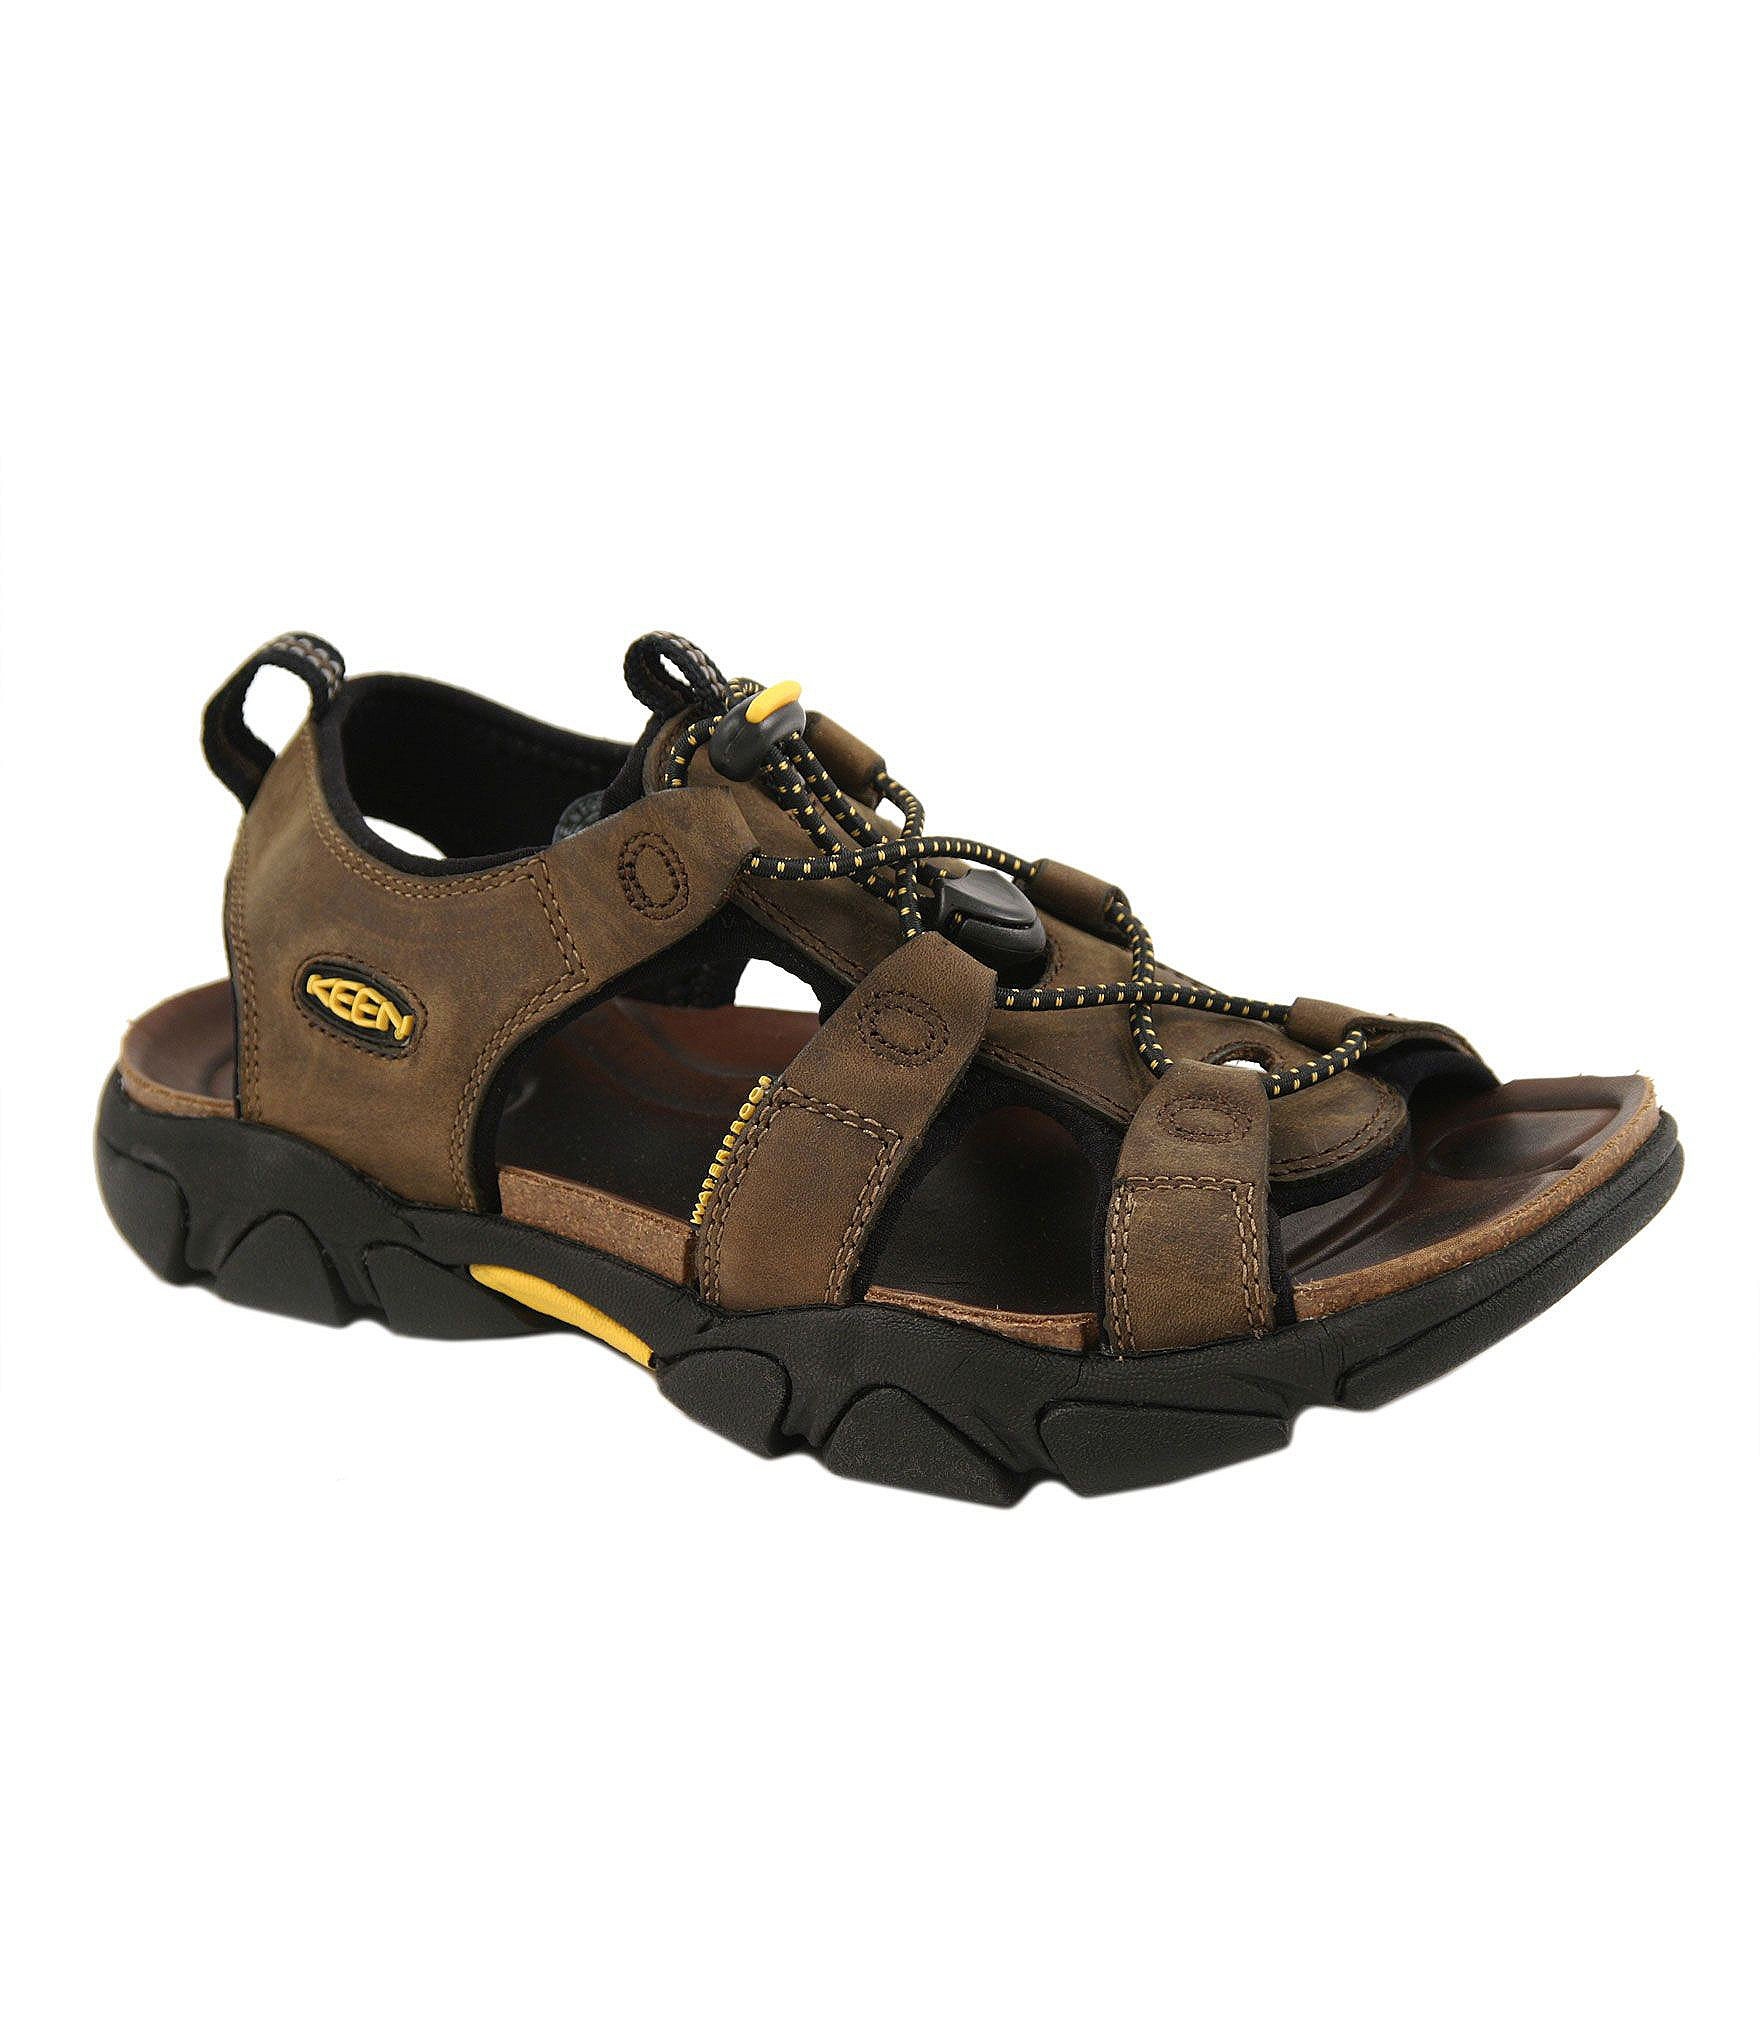 Keen Sarasota Athletic Sandals In Brown Lyst